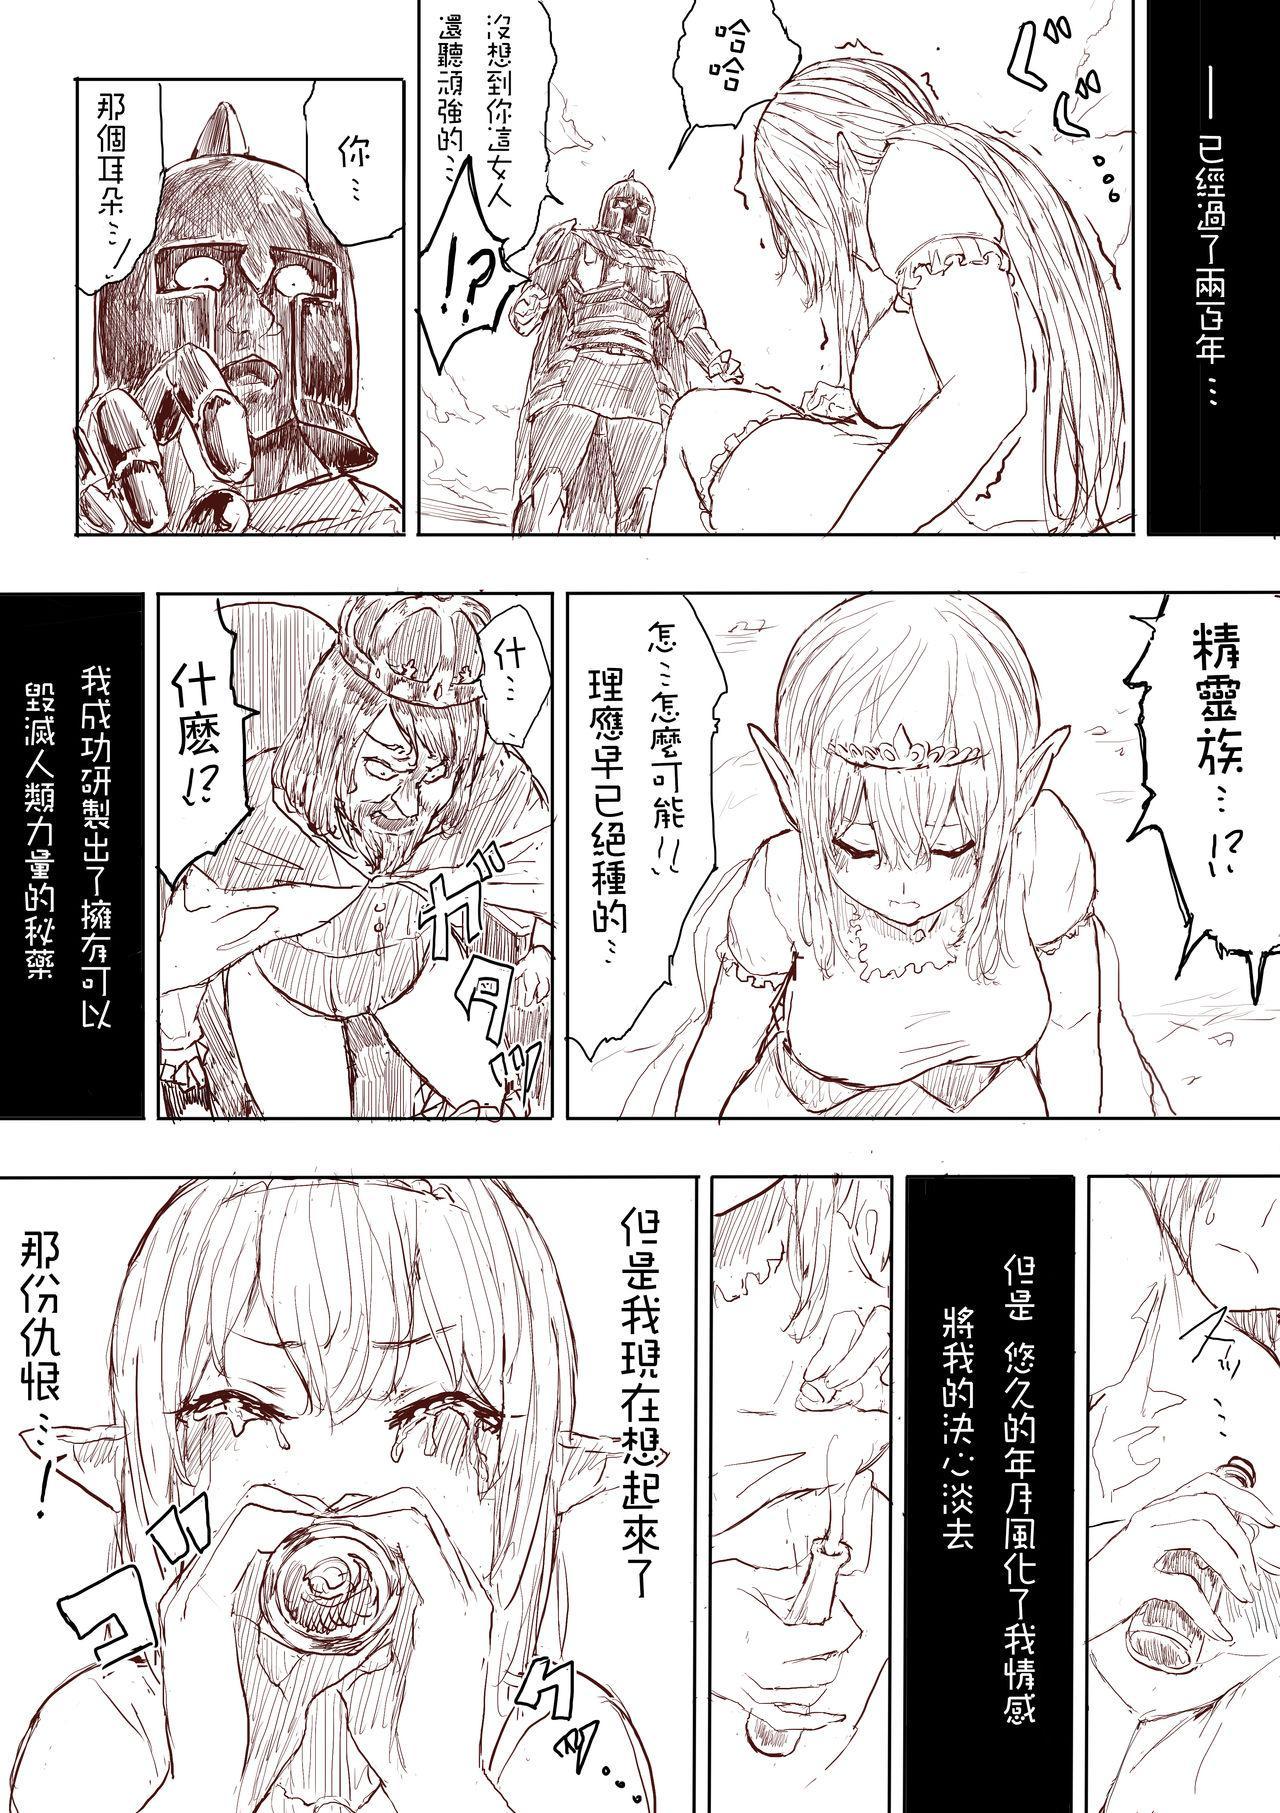 Elf Princess Strikes Back Part1 12